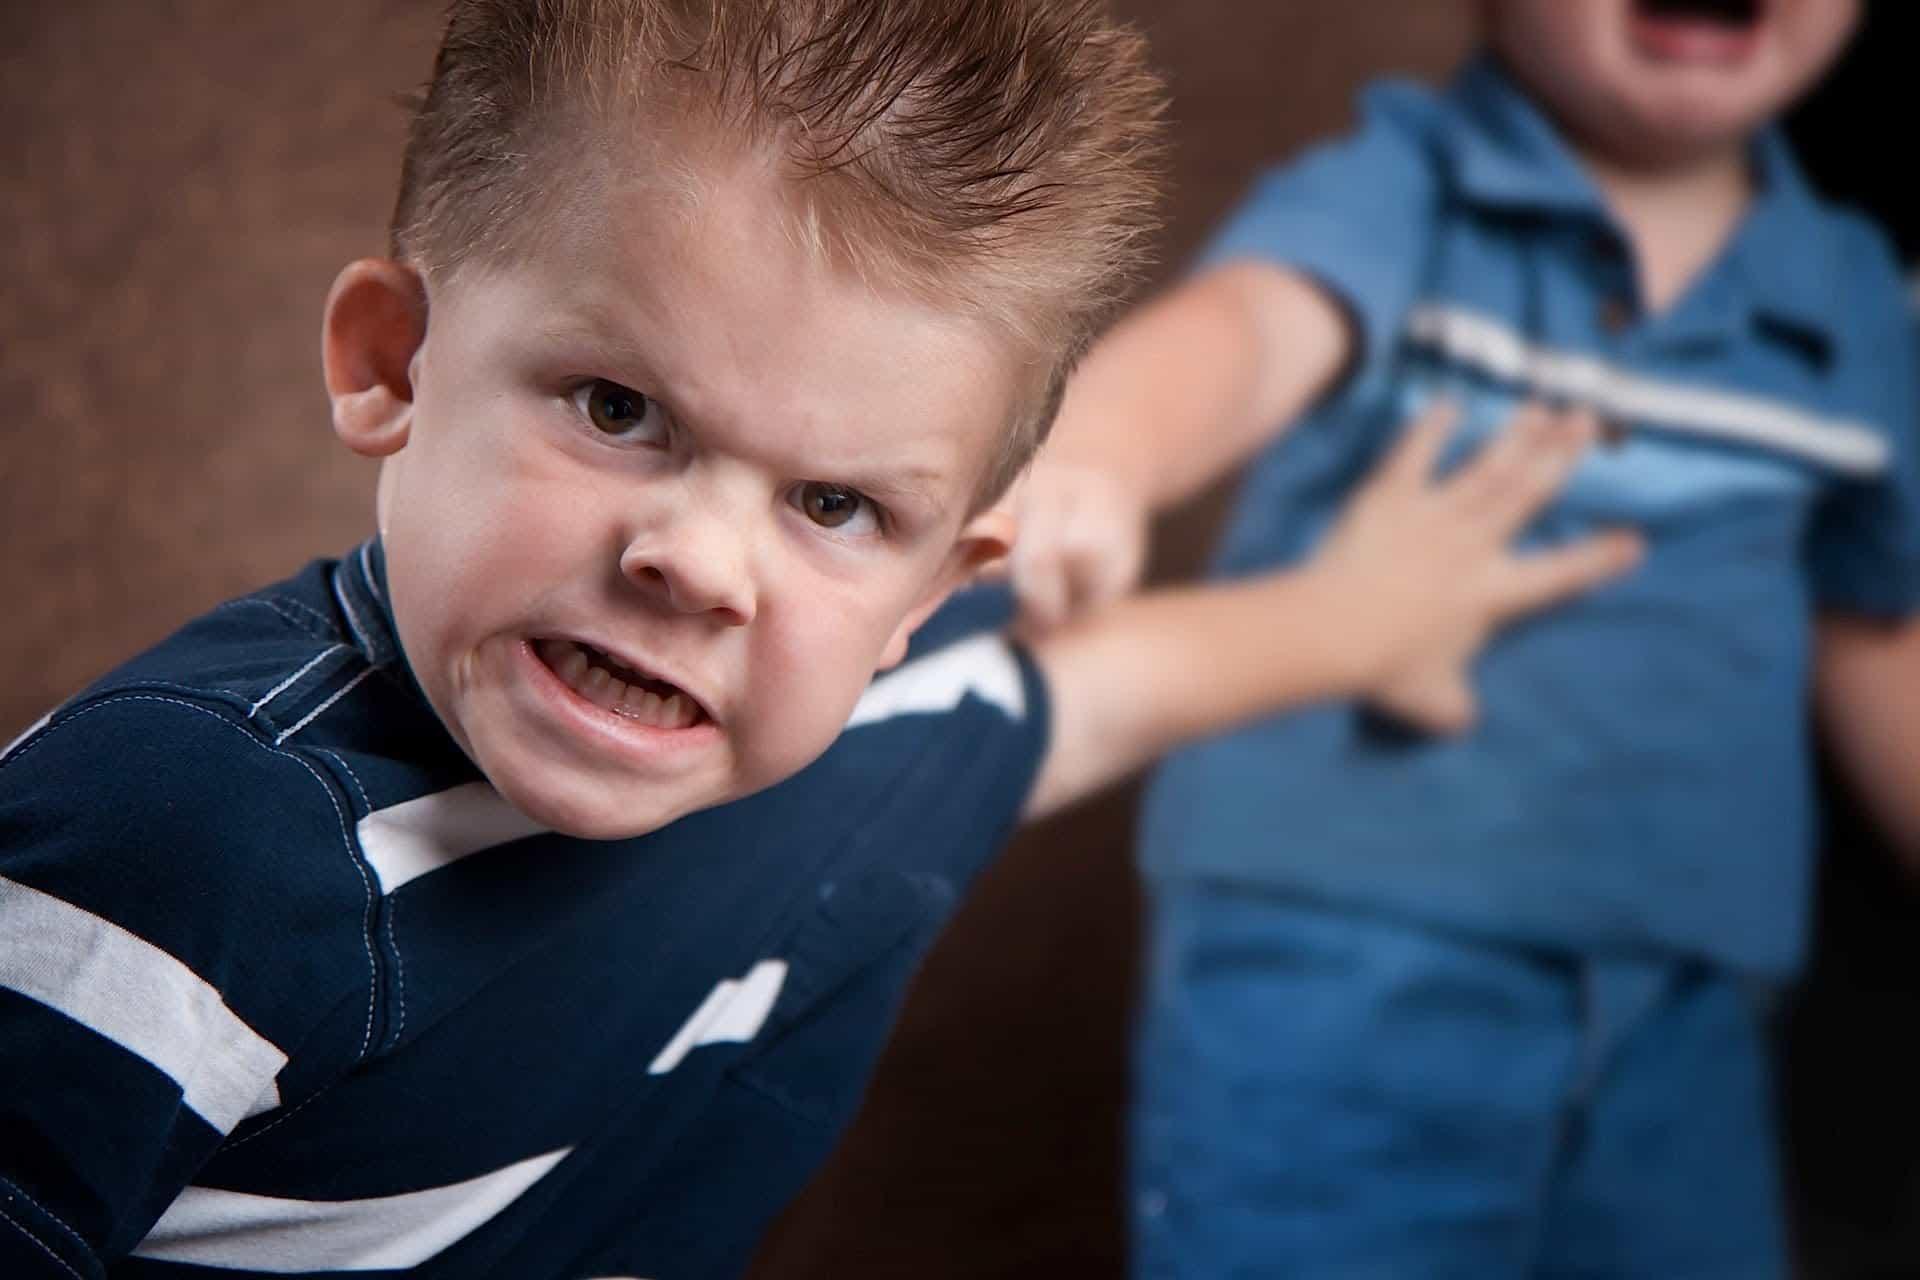 Photo of العدوانية عند الاطفال ولماذا ينشأ طفل عدواني والأخر لا